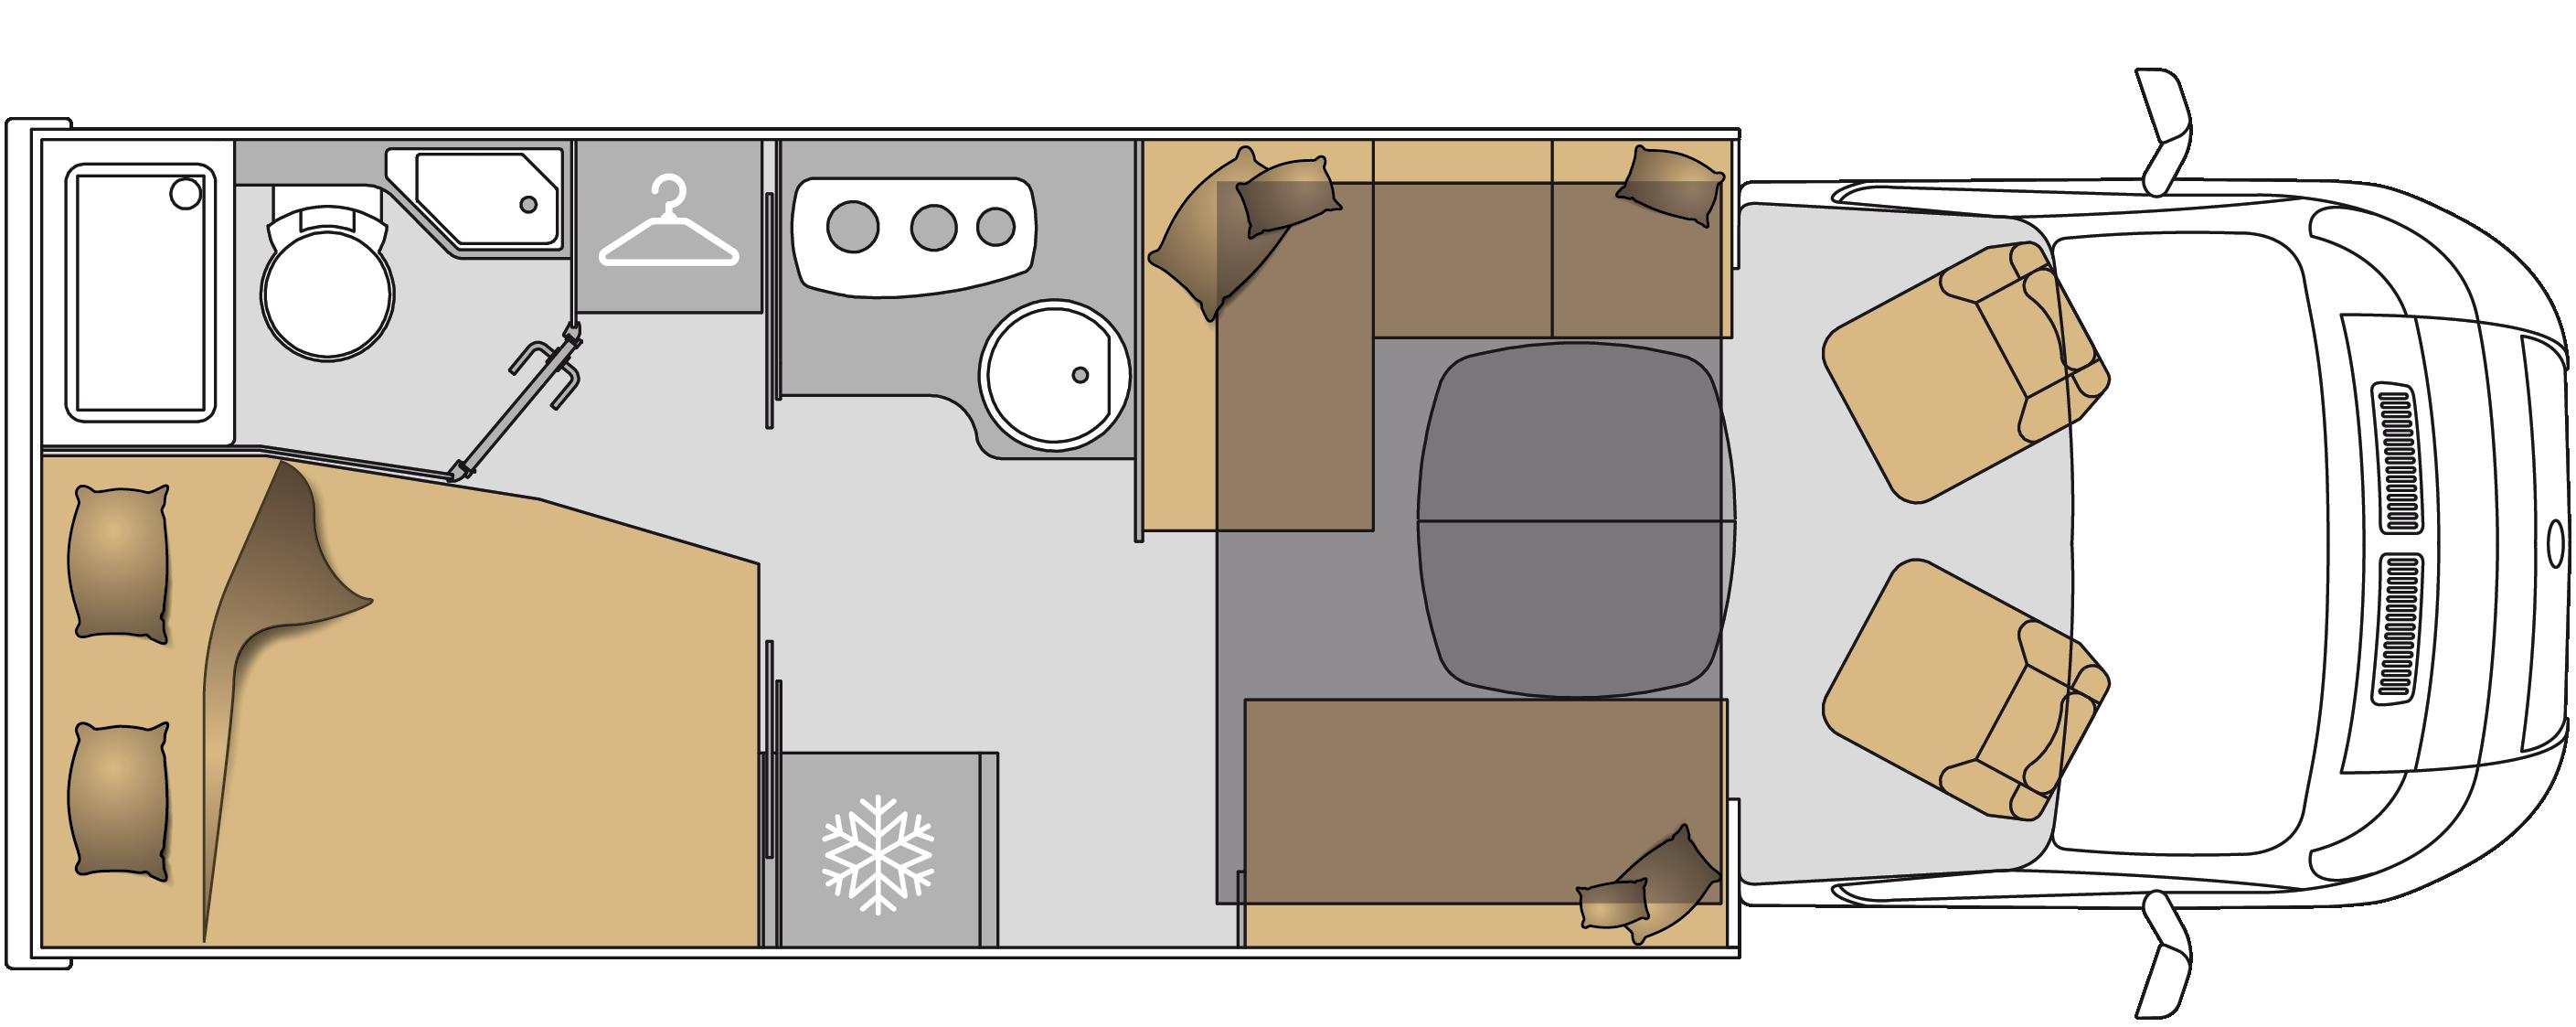 Wohnmobil TEI-71FBH Grundriss